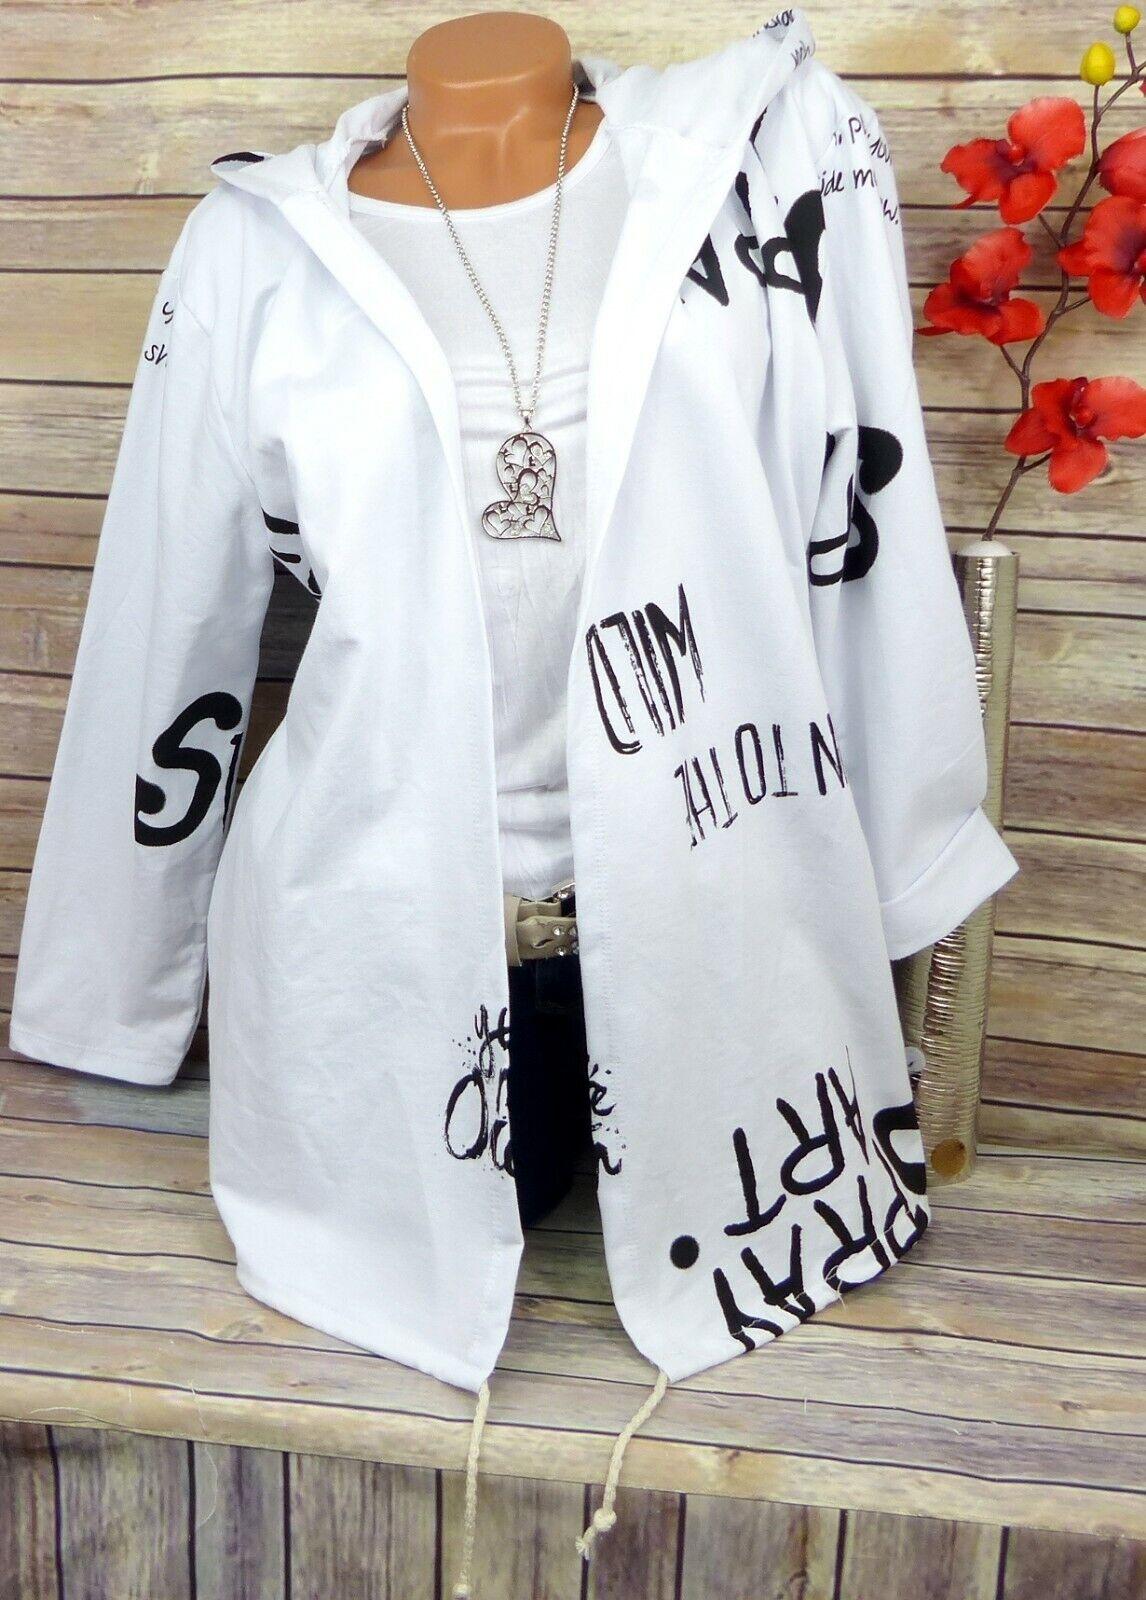 Jacke Tunika Bluse Blusenjacke Shirt Lagenlook Longshirt Kapuze Weiß BW 44 46